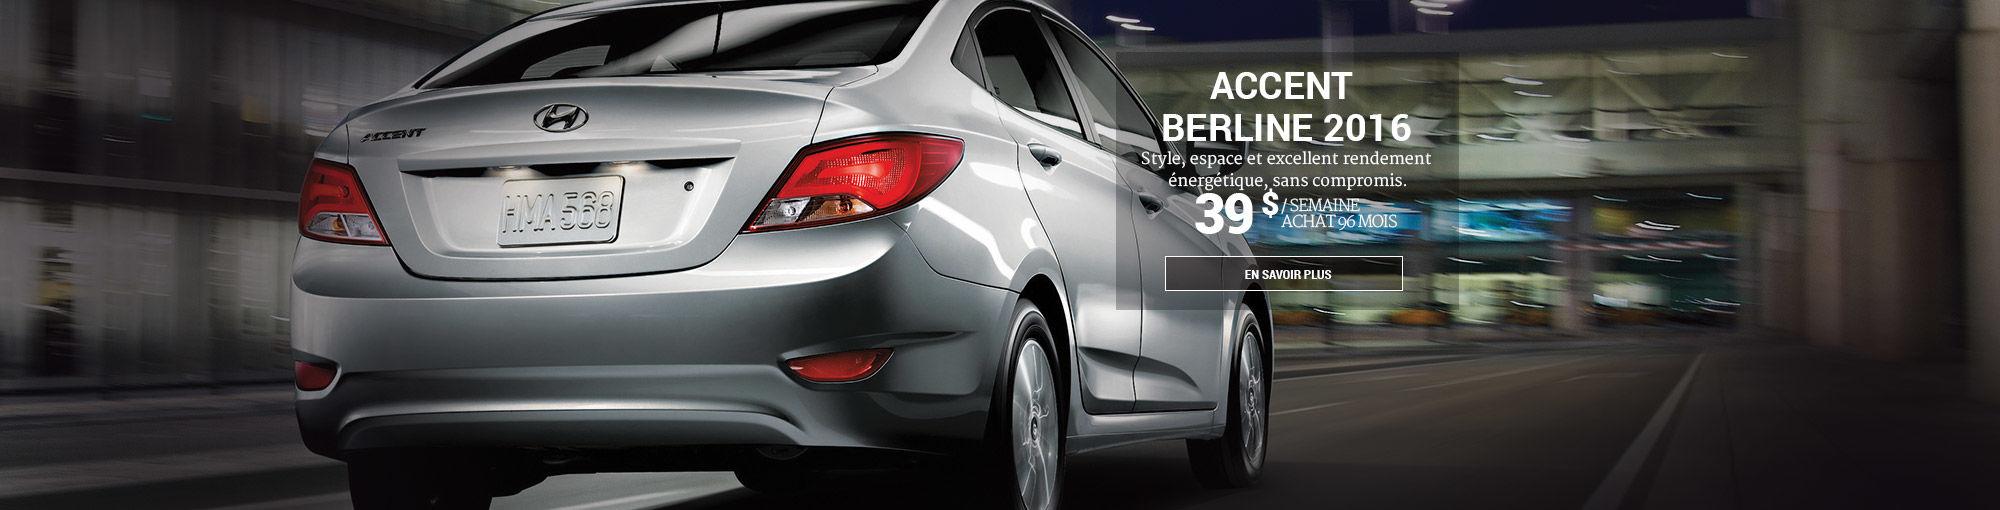 Hyundai Accent 2016 - header - juillet 2016 HTR